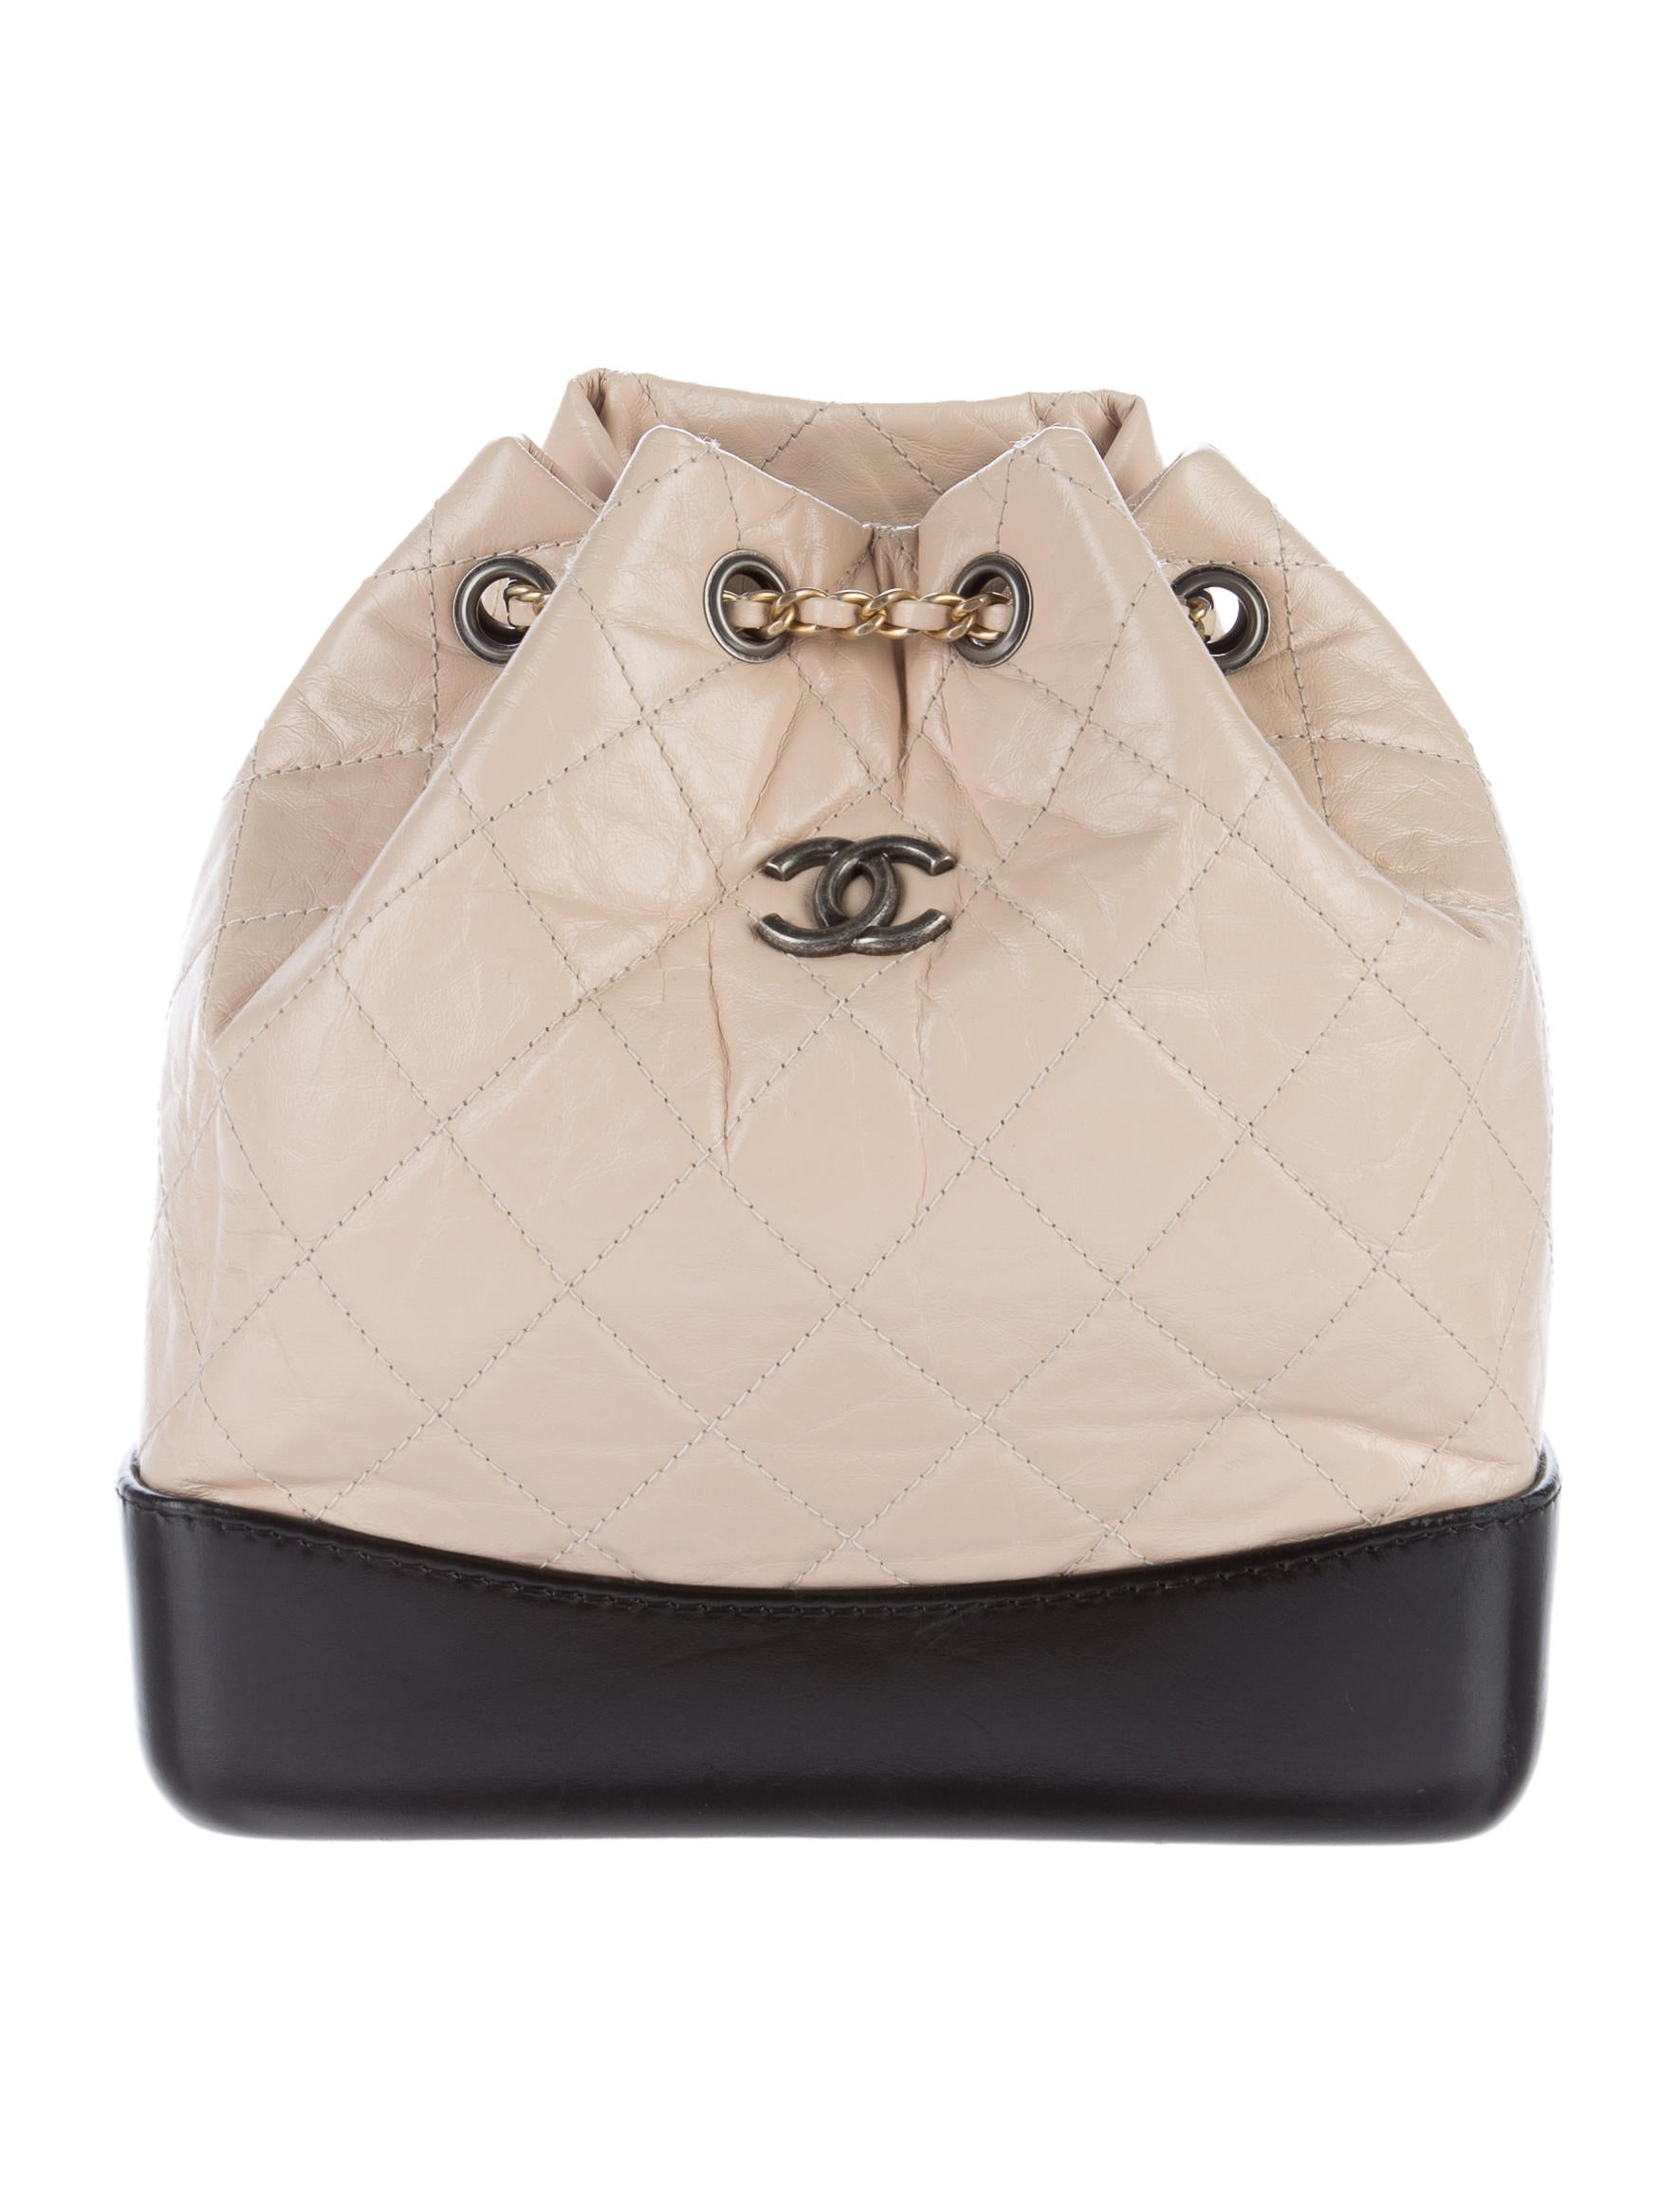 52883ad82b4458 Chanel 2017 Gabrielle Backpack - Handbags - CHA167040 | The RealReal